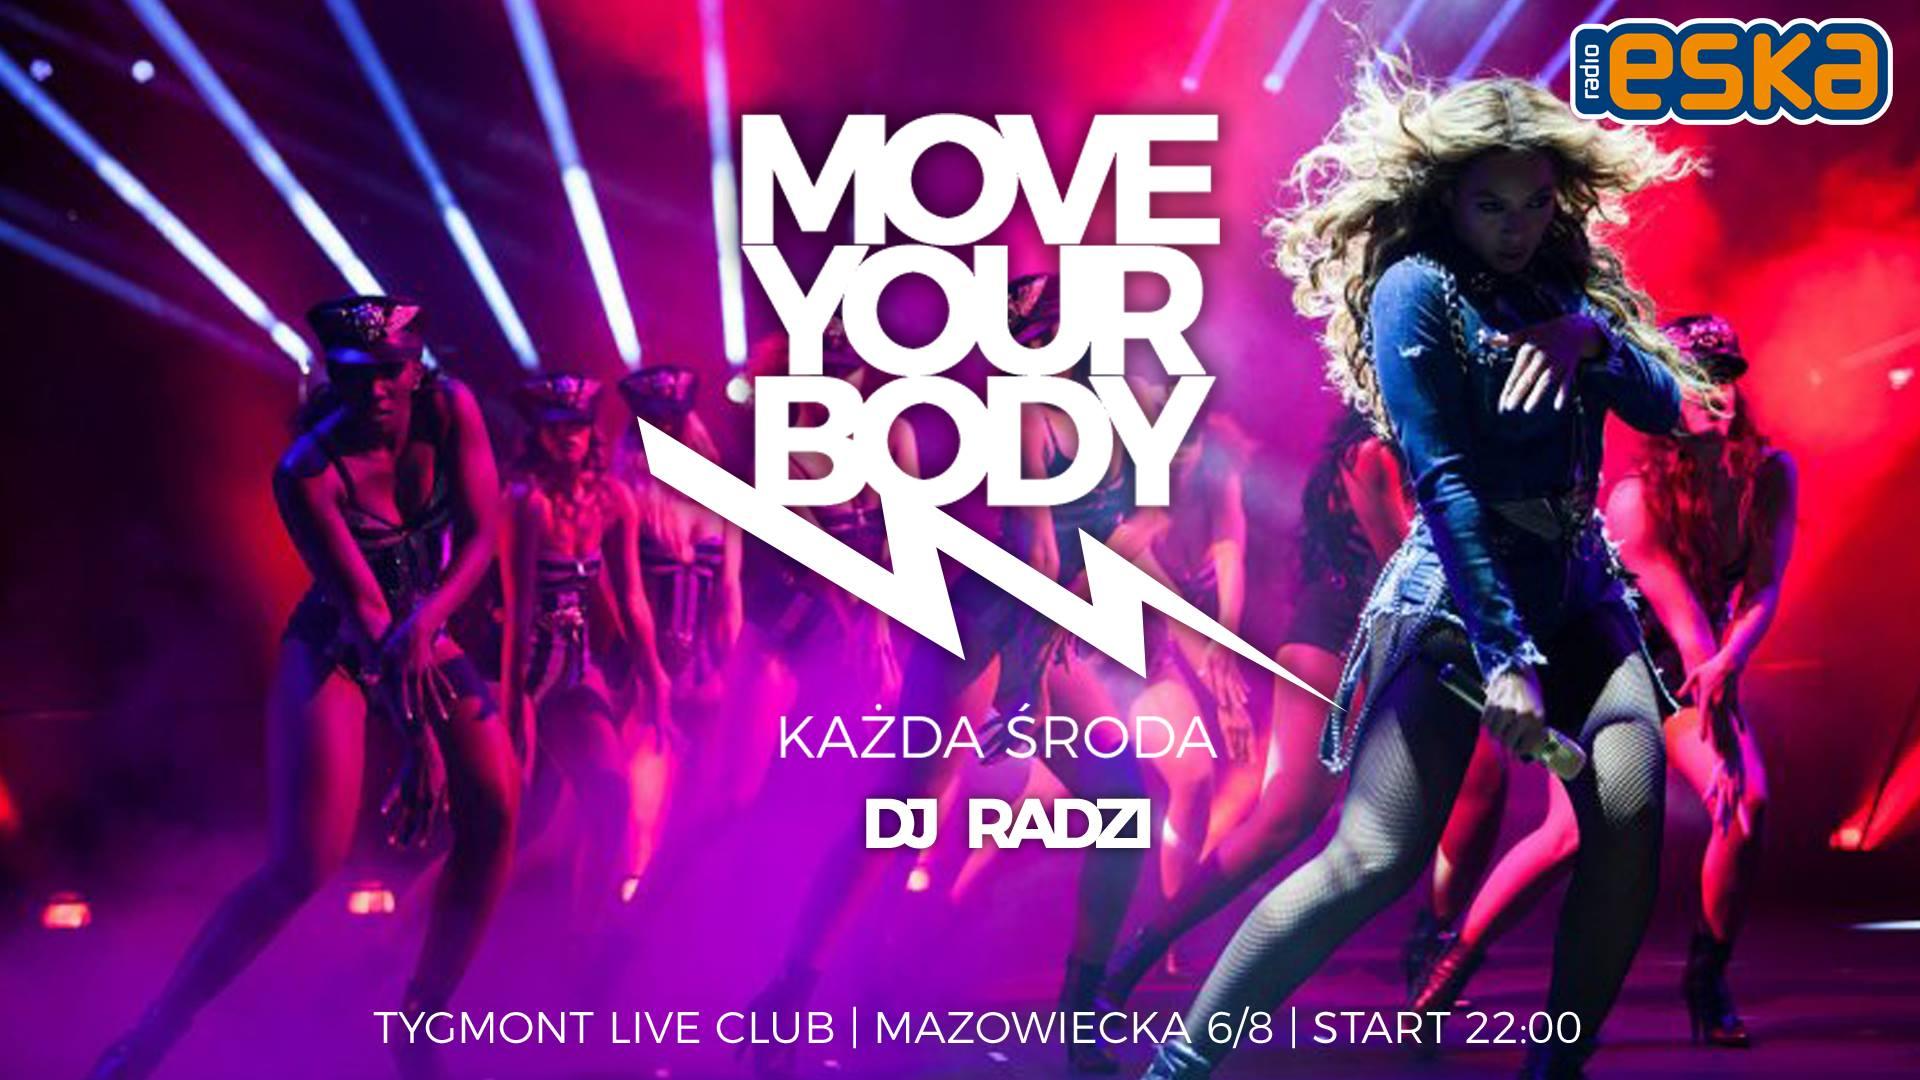 move your body sroda